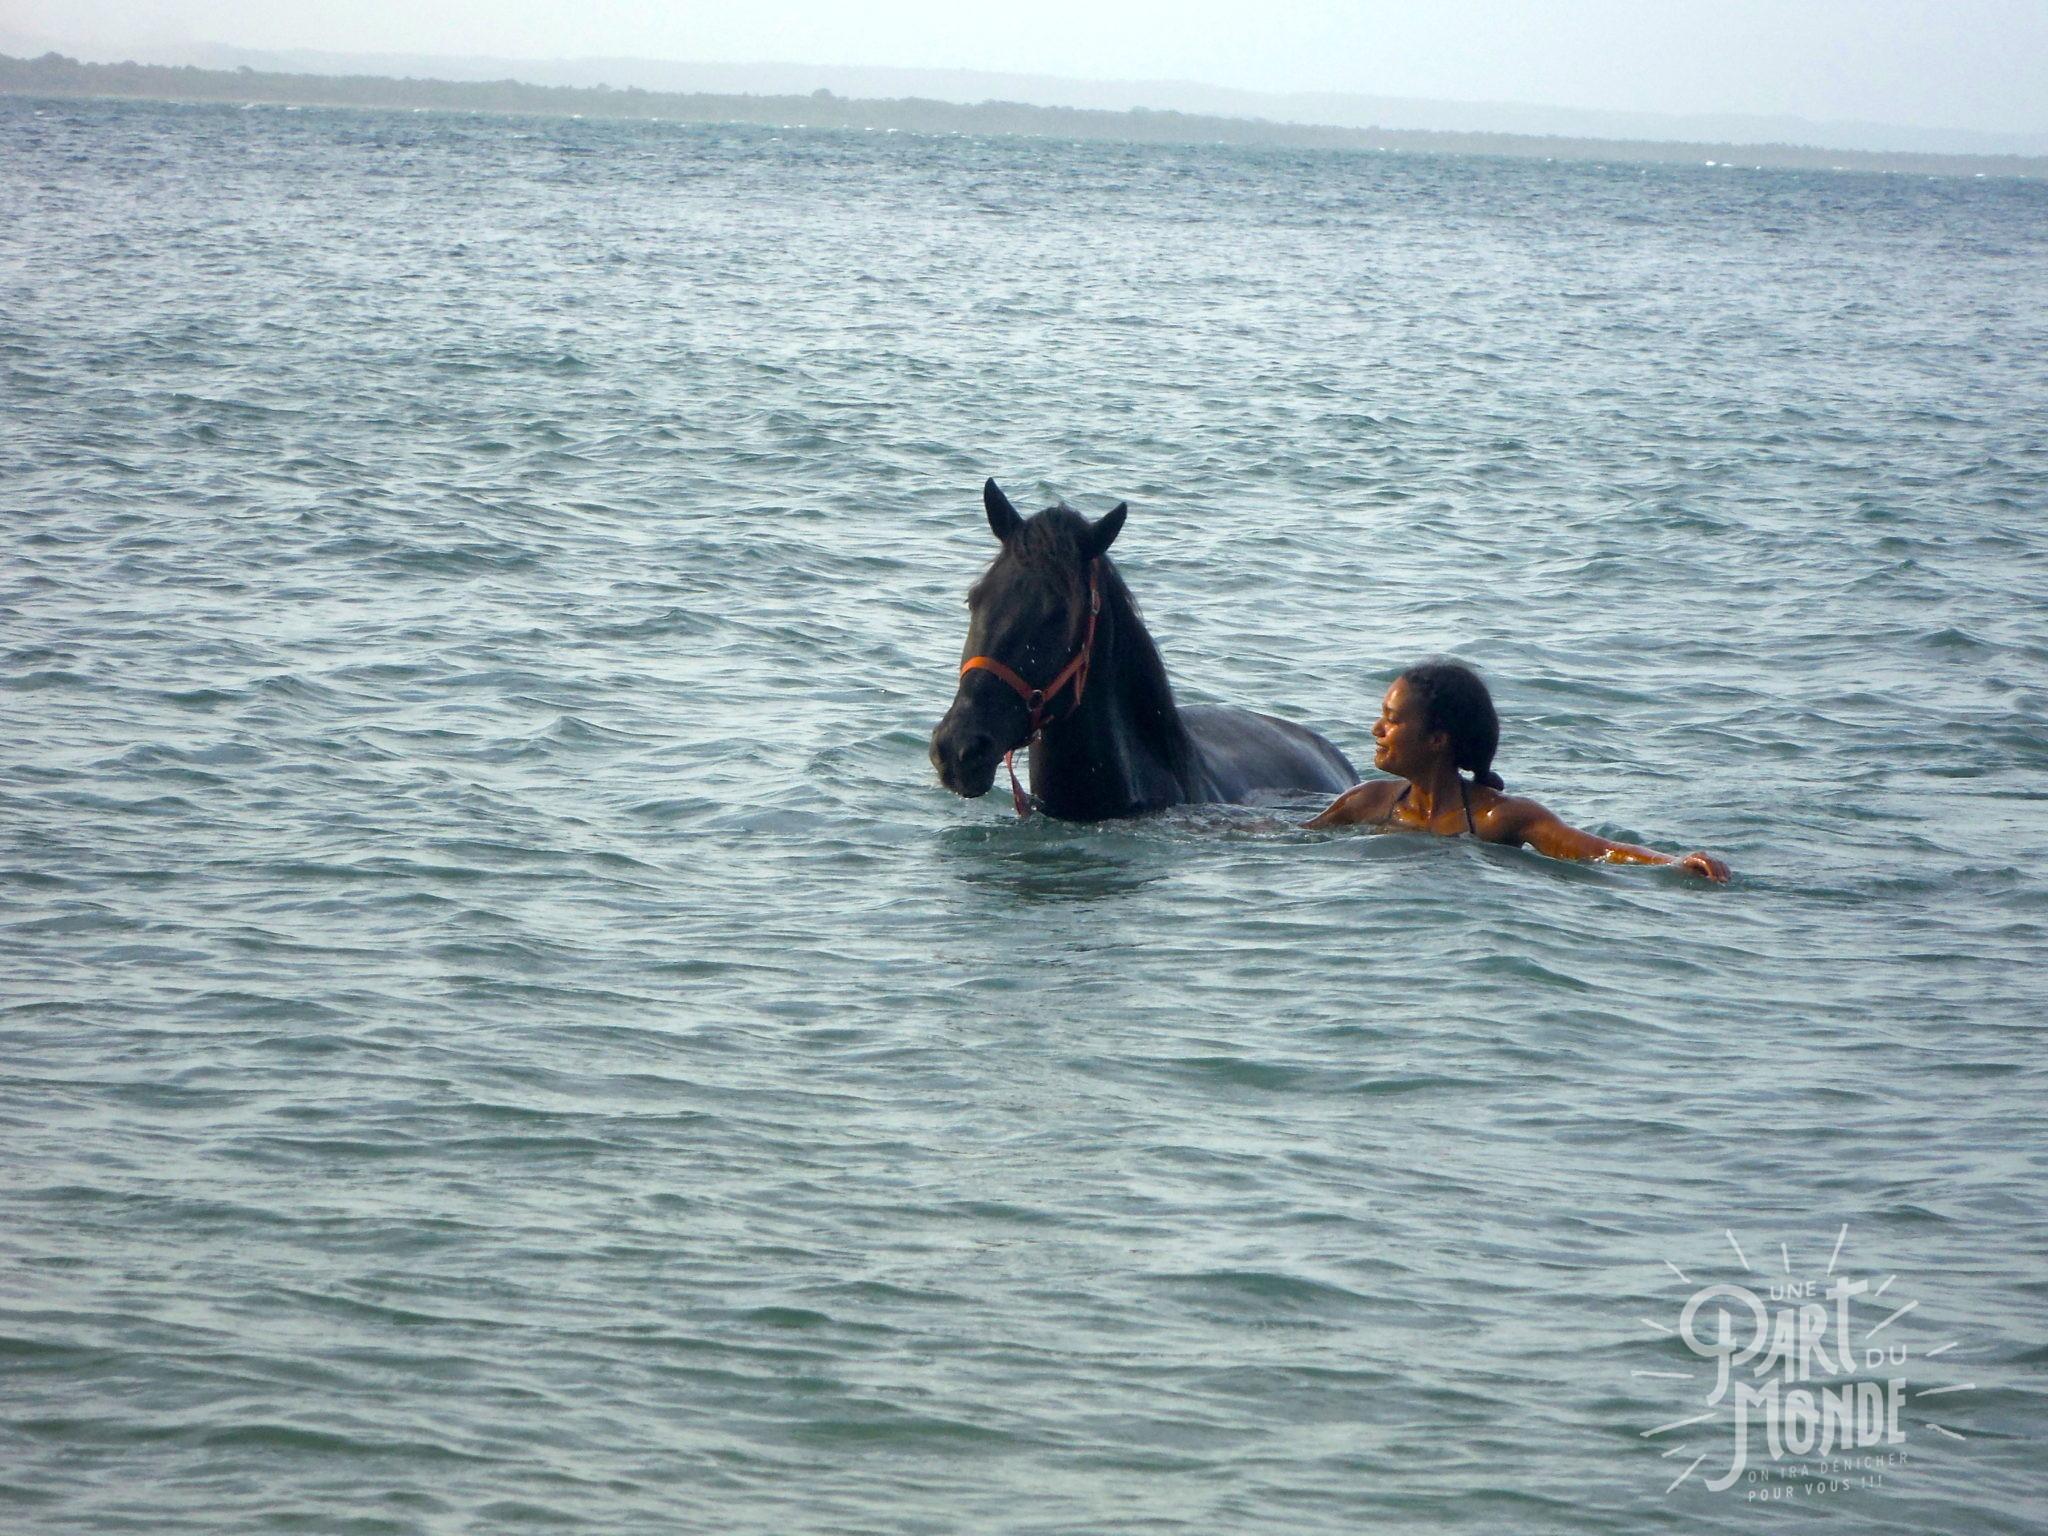 île de tinharé nage cheval